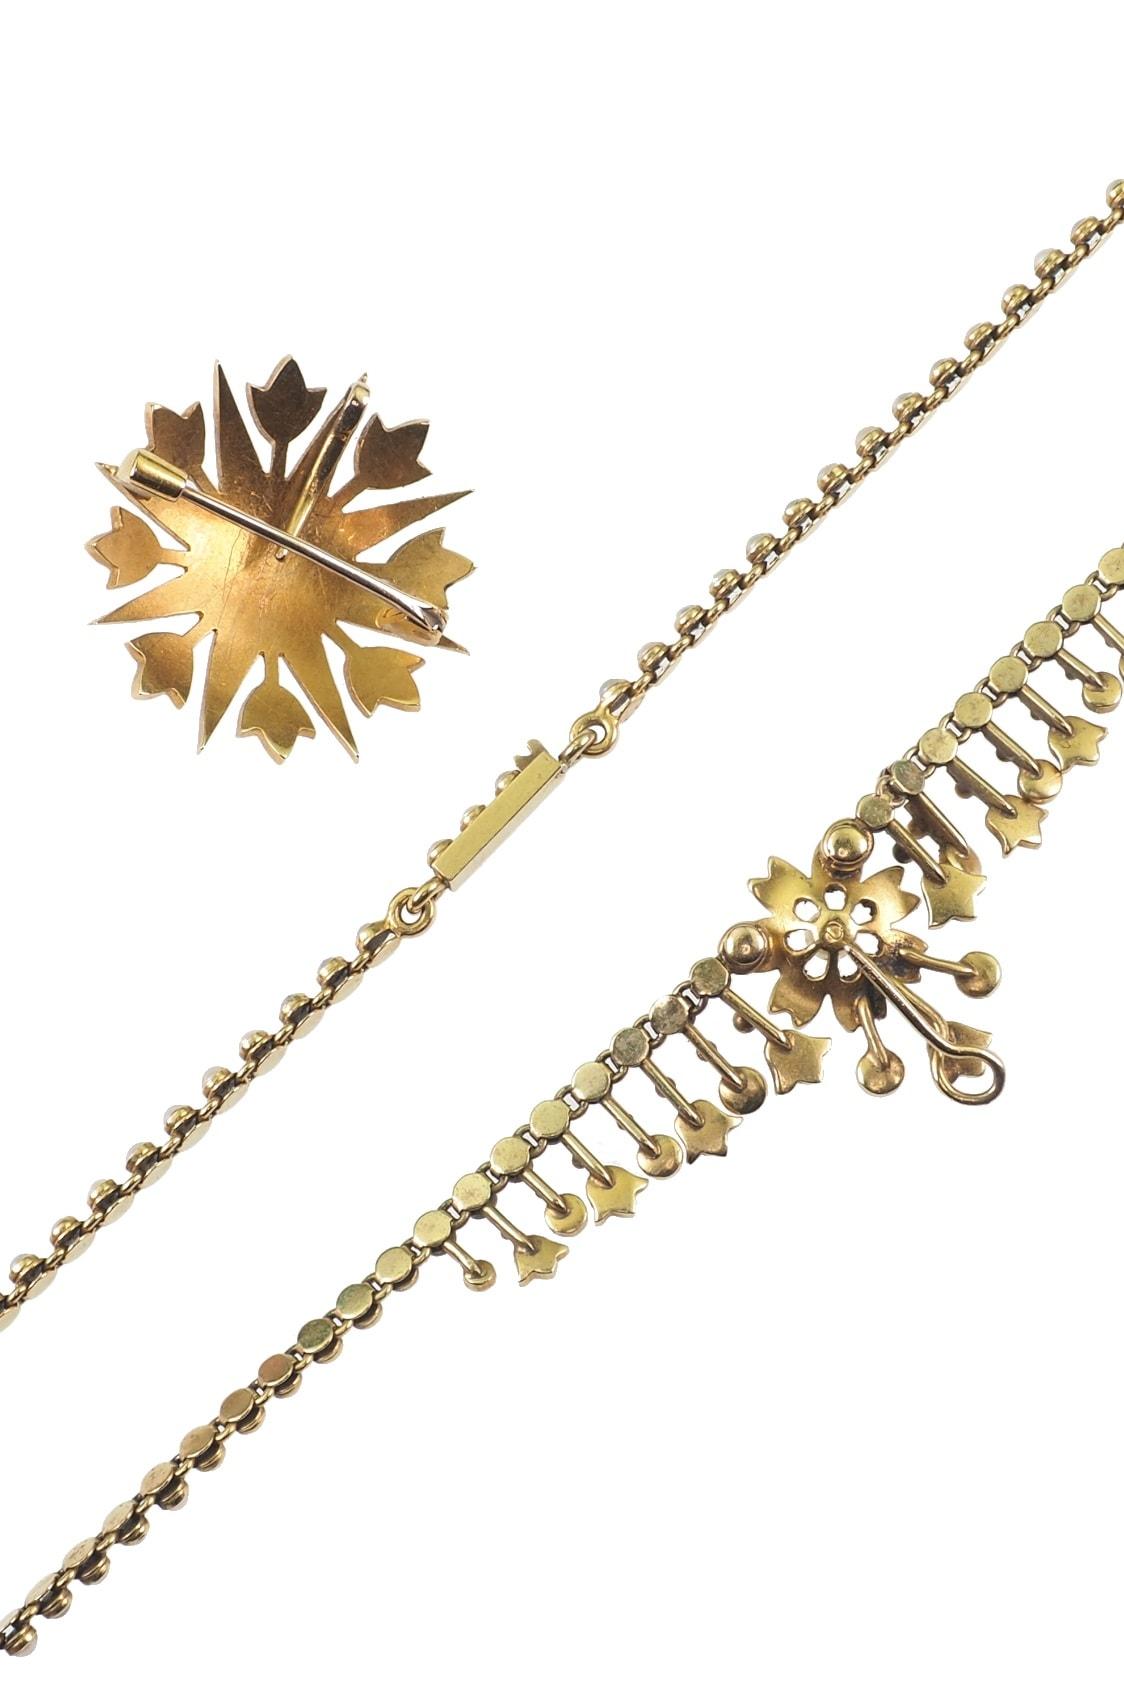 antike-Goldcolliers-kaufen-0653d